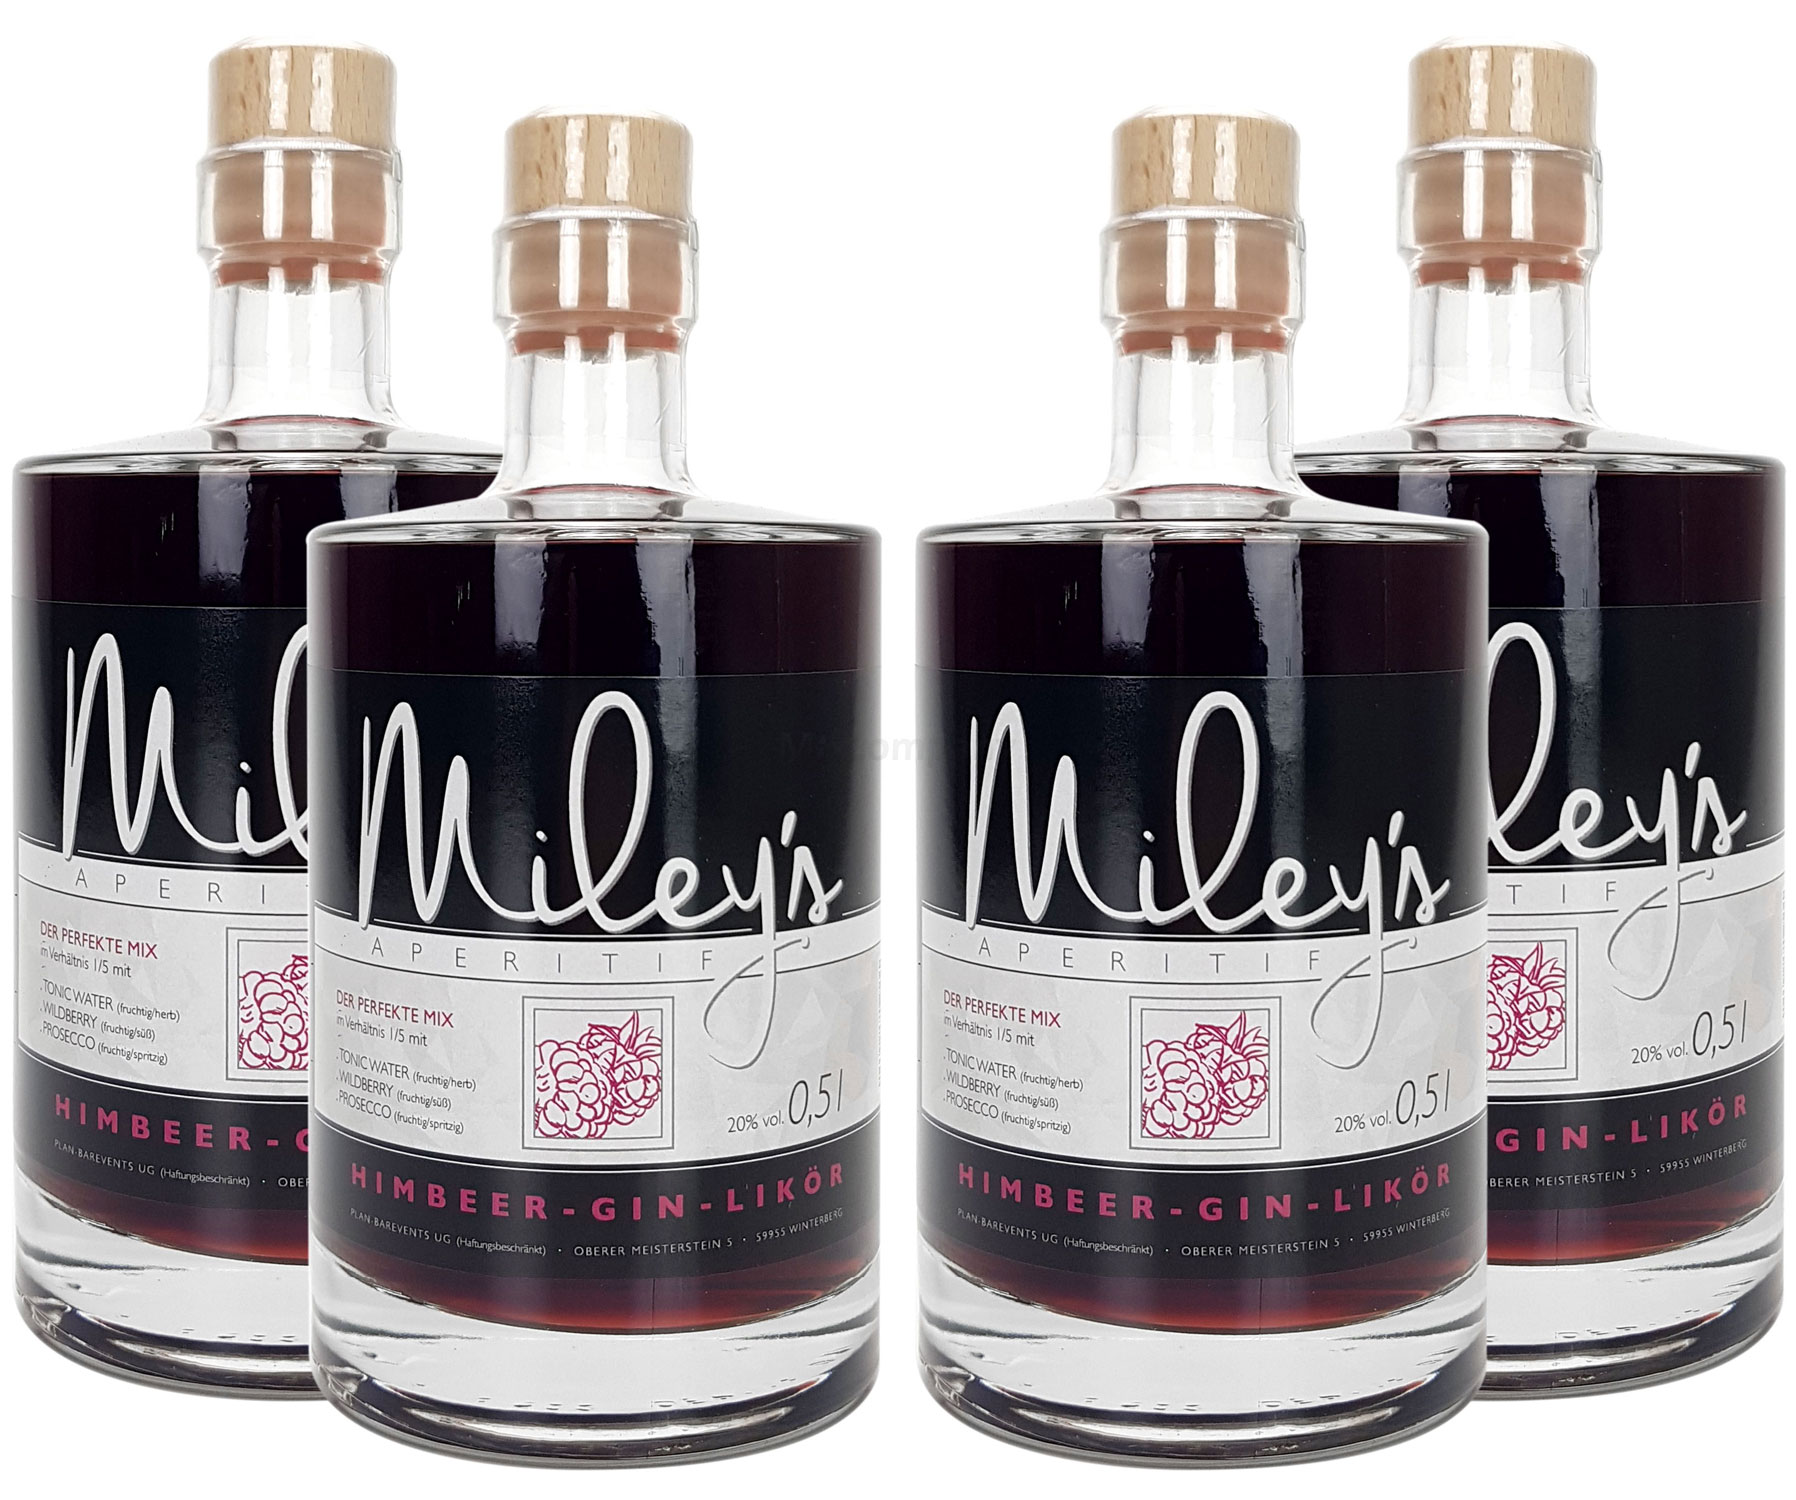 Mileys Himbeer Wild Berry Himbeer-Gin-Likör Set - 4x 0,5l = 2l (20% Vol)